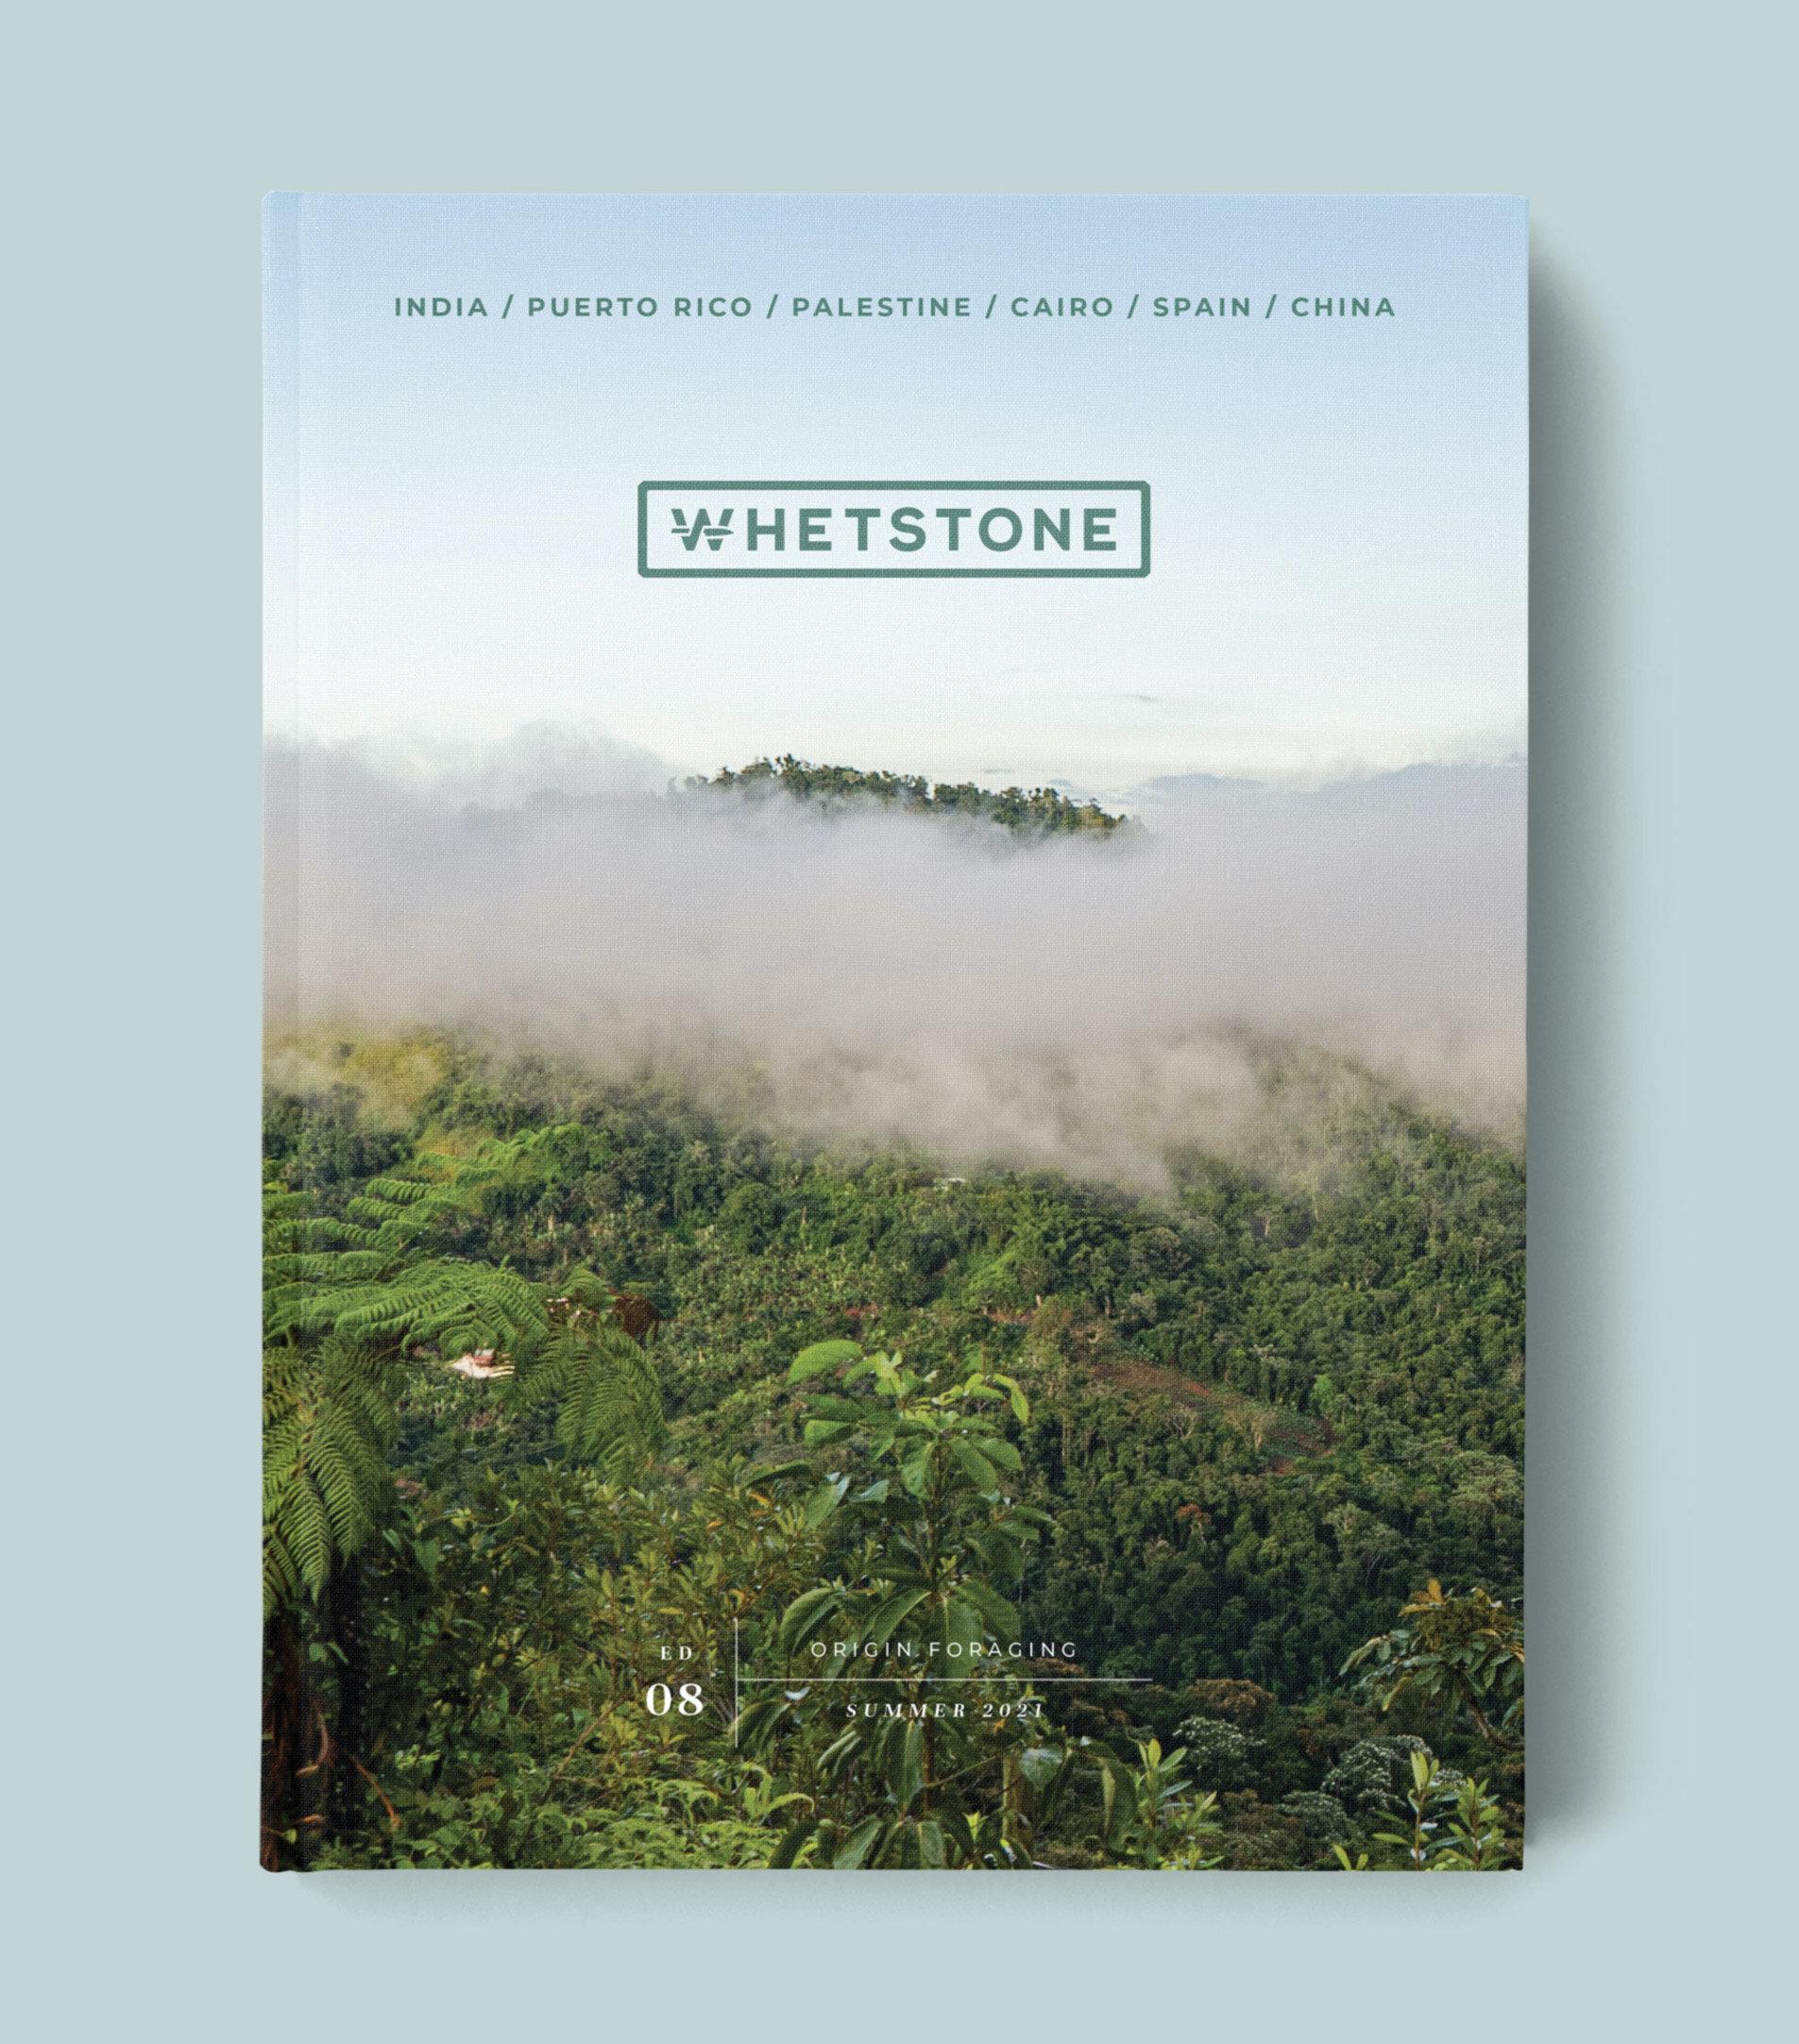 Betway体育官方网站必威备用网址滚球Whetstone杂志:第08卷-阅读W杂志的摘录。